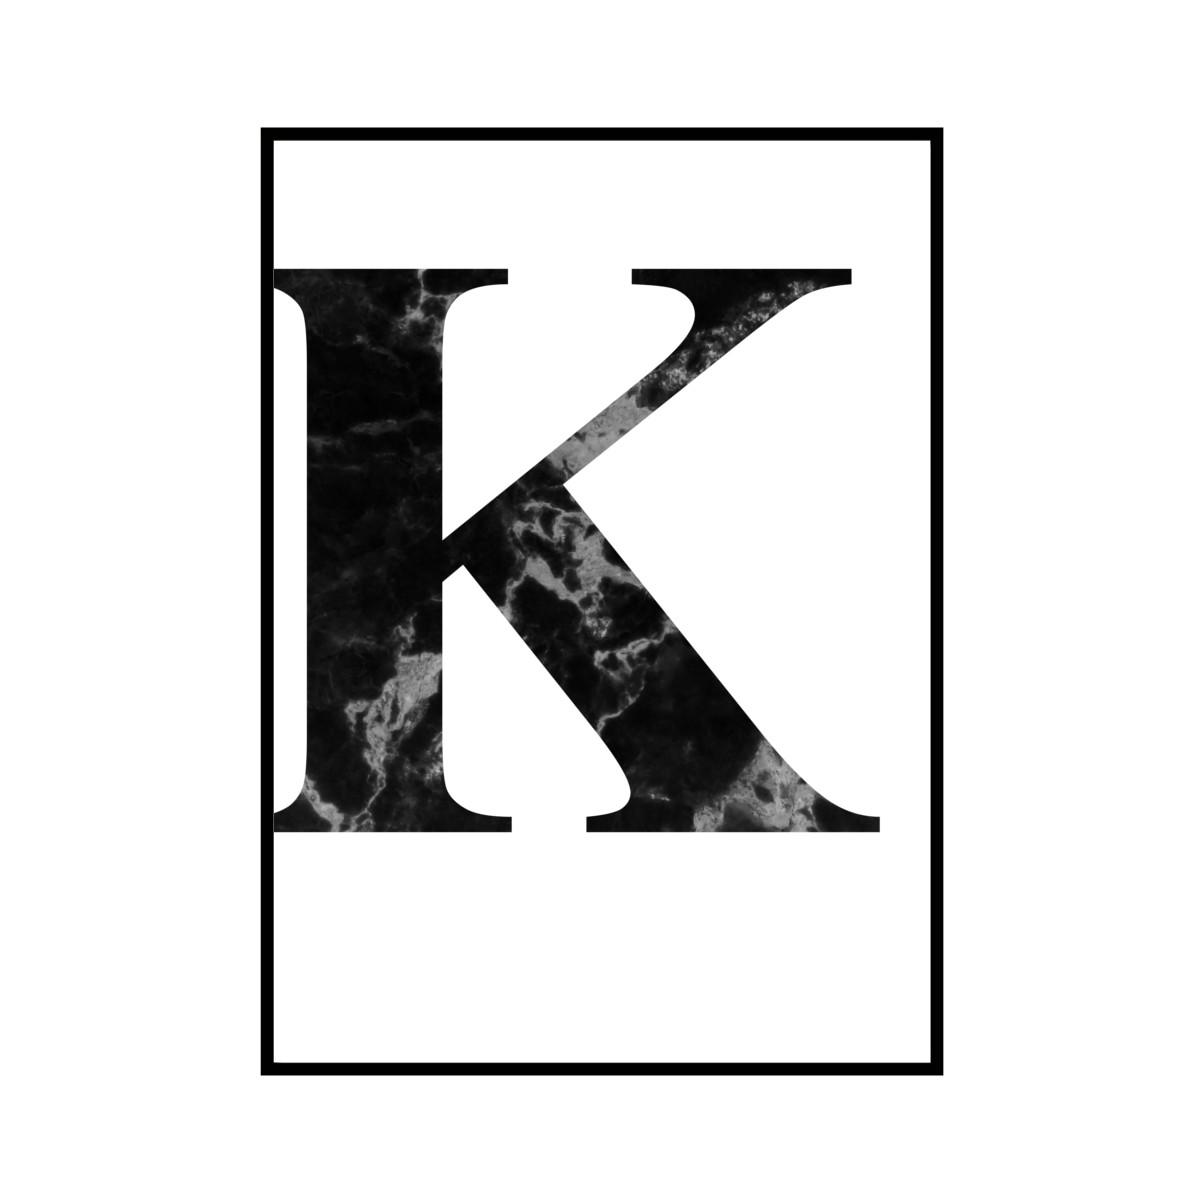 """K"" 黒大理石 - Black marble - ALPHAシリーズ [SD-000512] B4サイズ フレームセット"